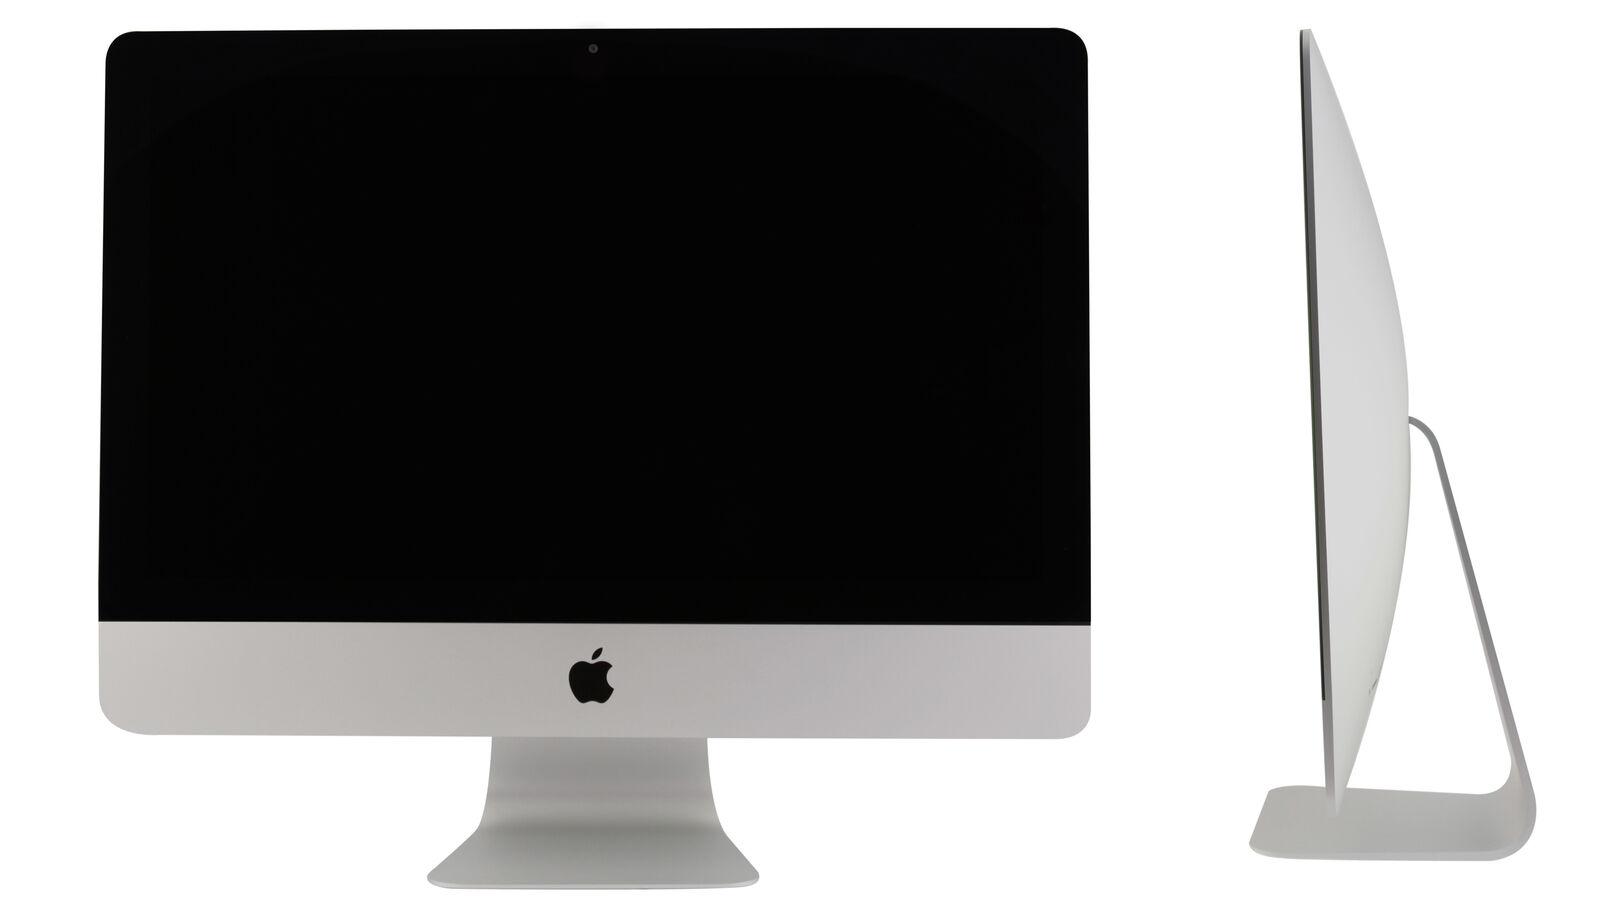 Apple iMac 21,5 - i5, 8GB ram